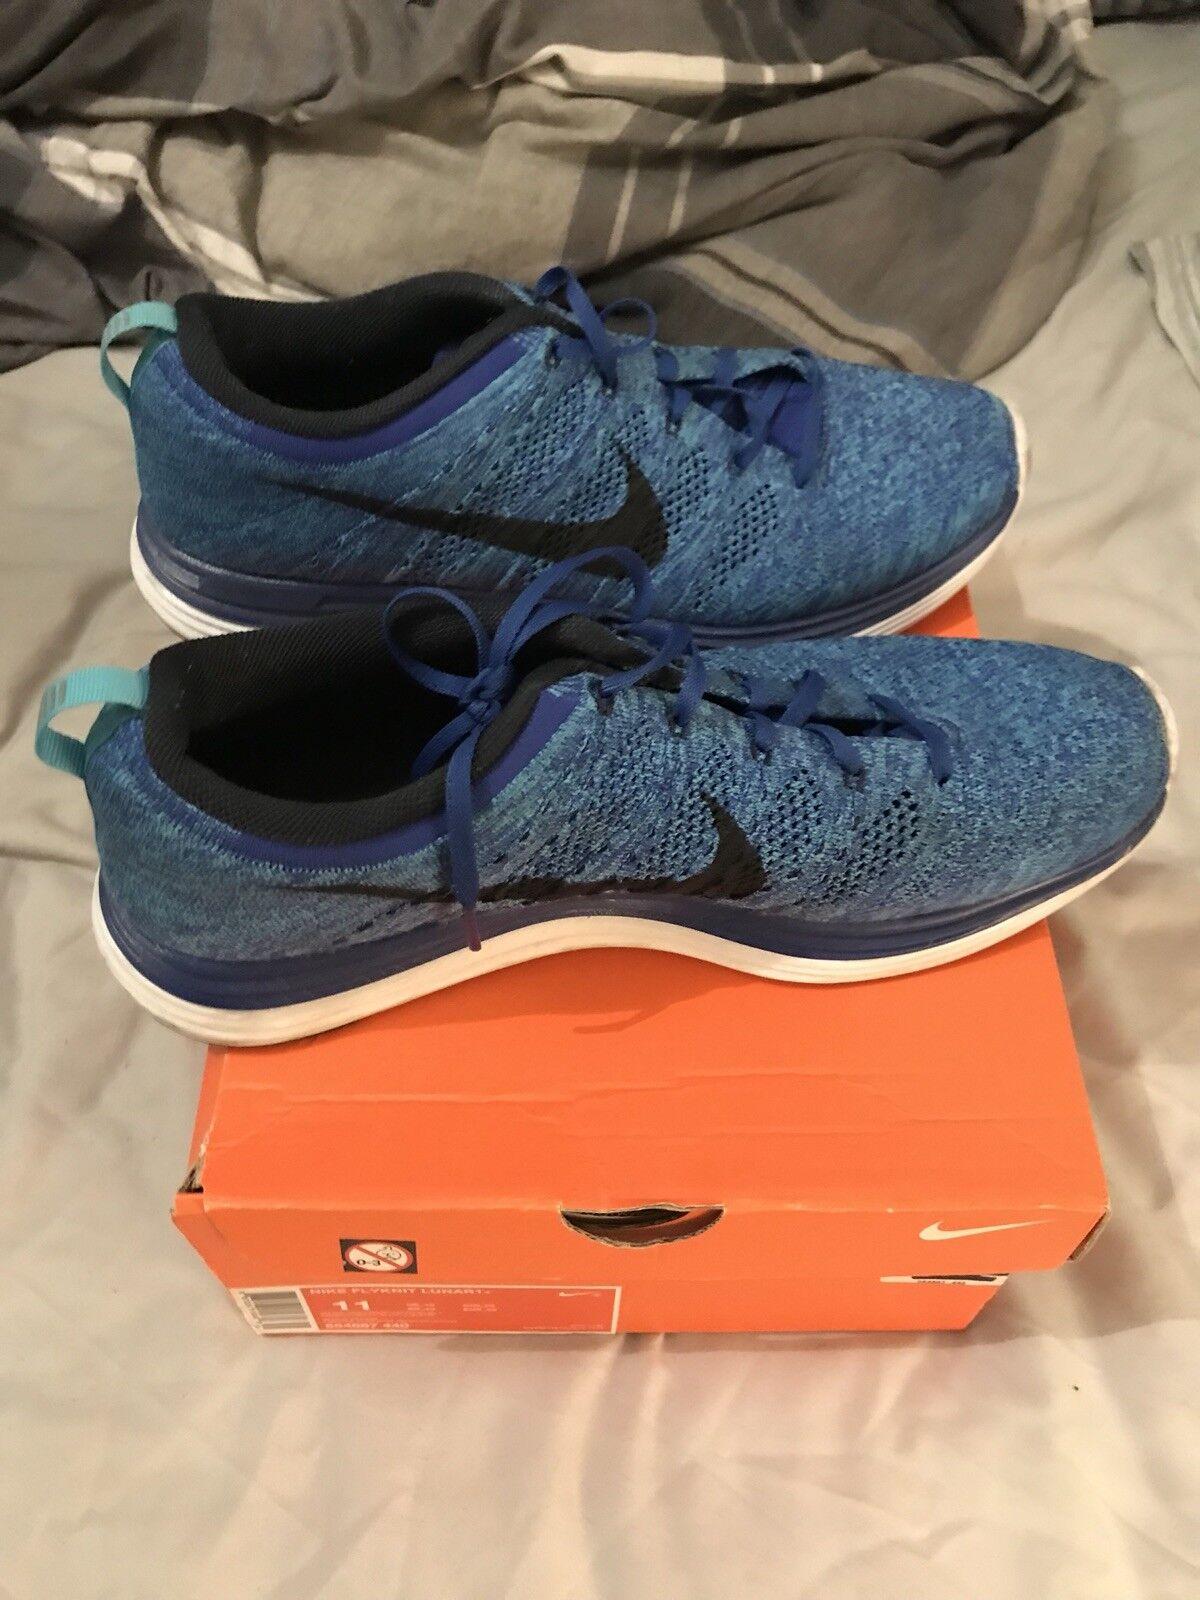 Nike Flyknit lunar 1 Rare Uk 10